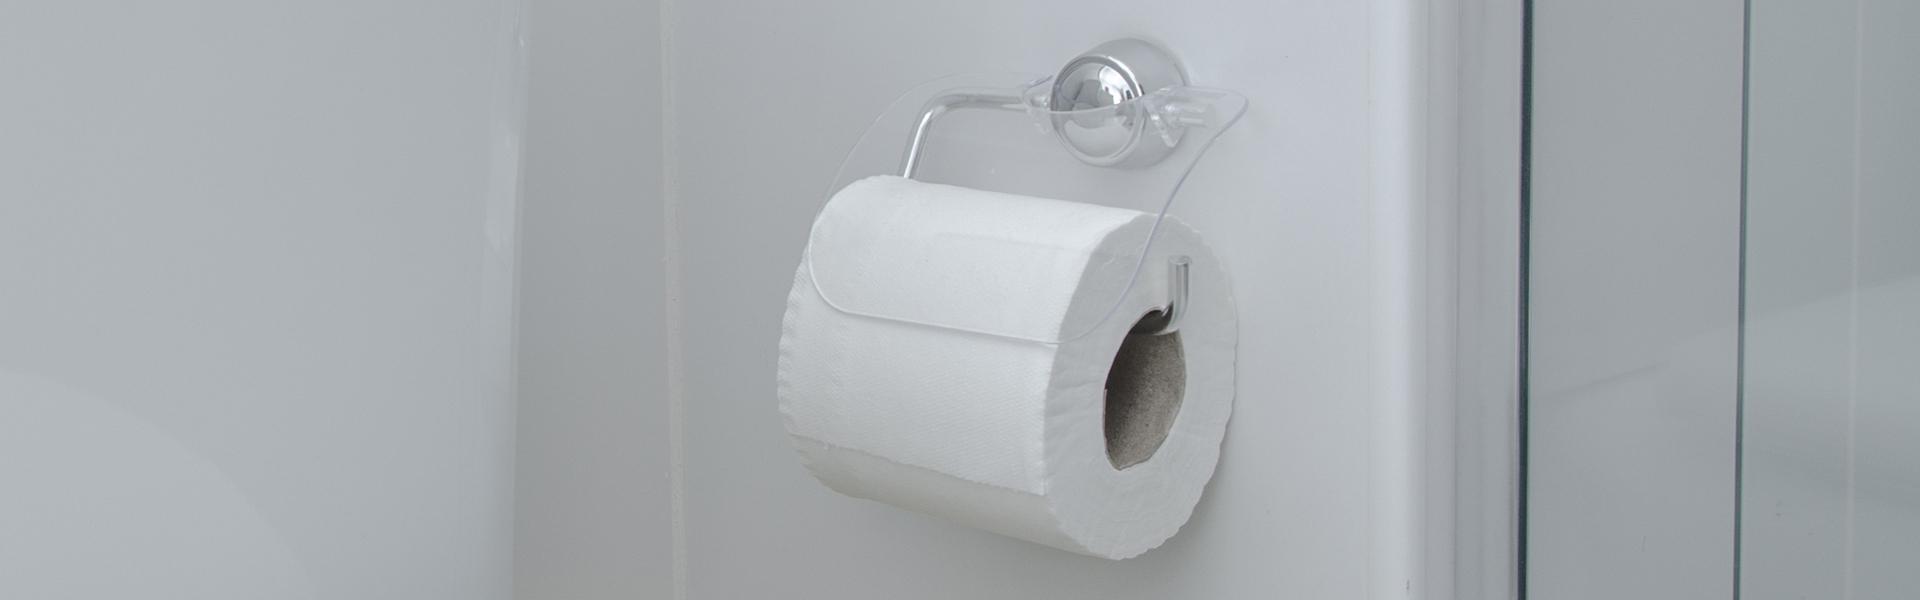 Banheiro - Papeleiras